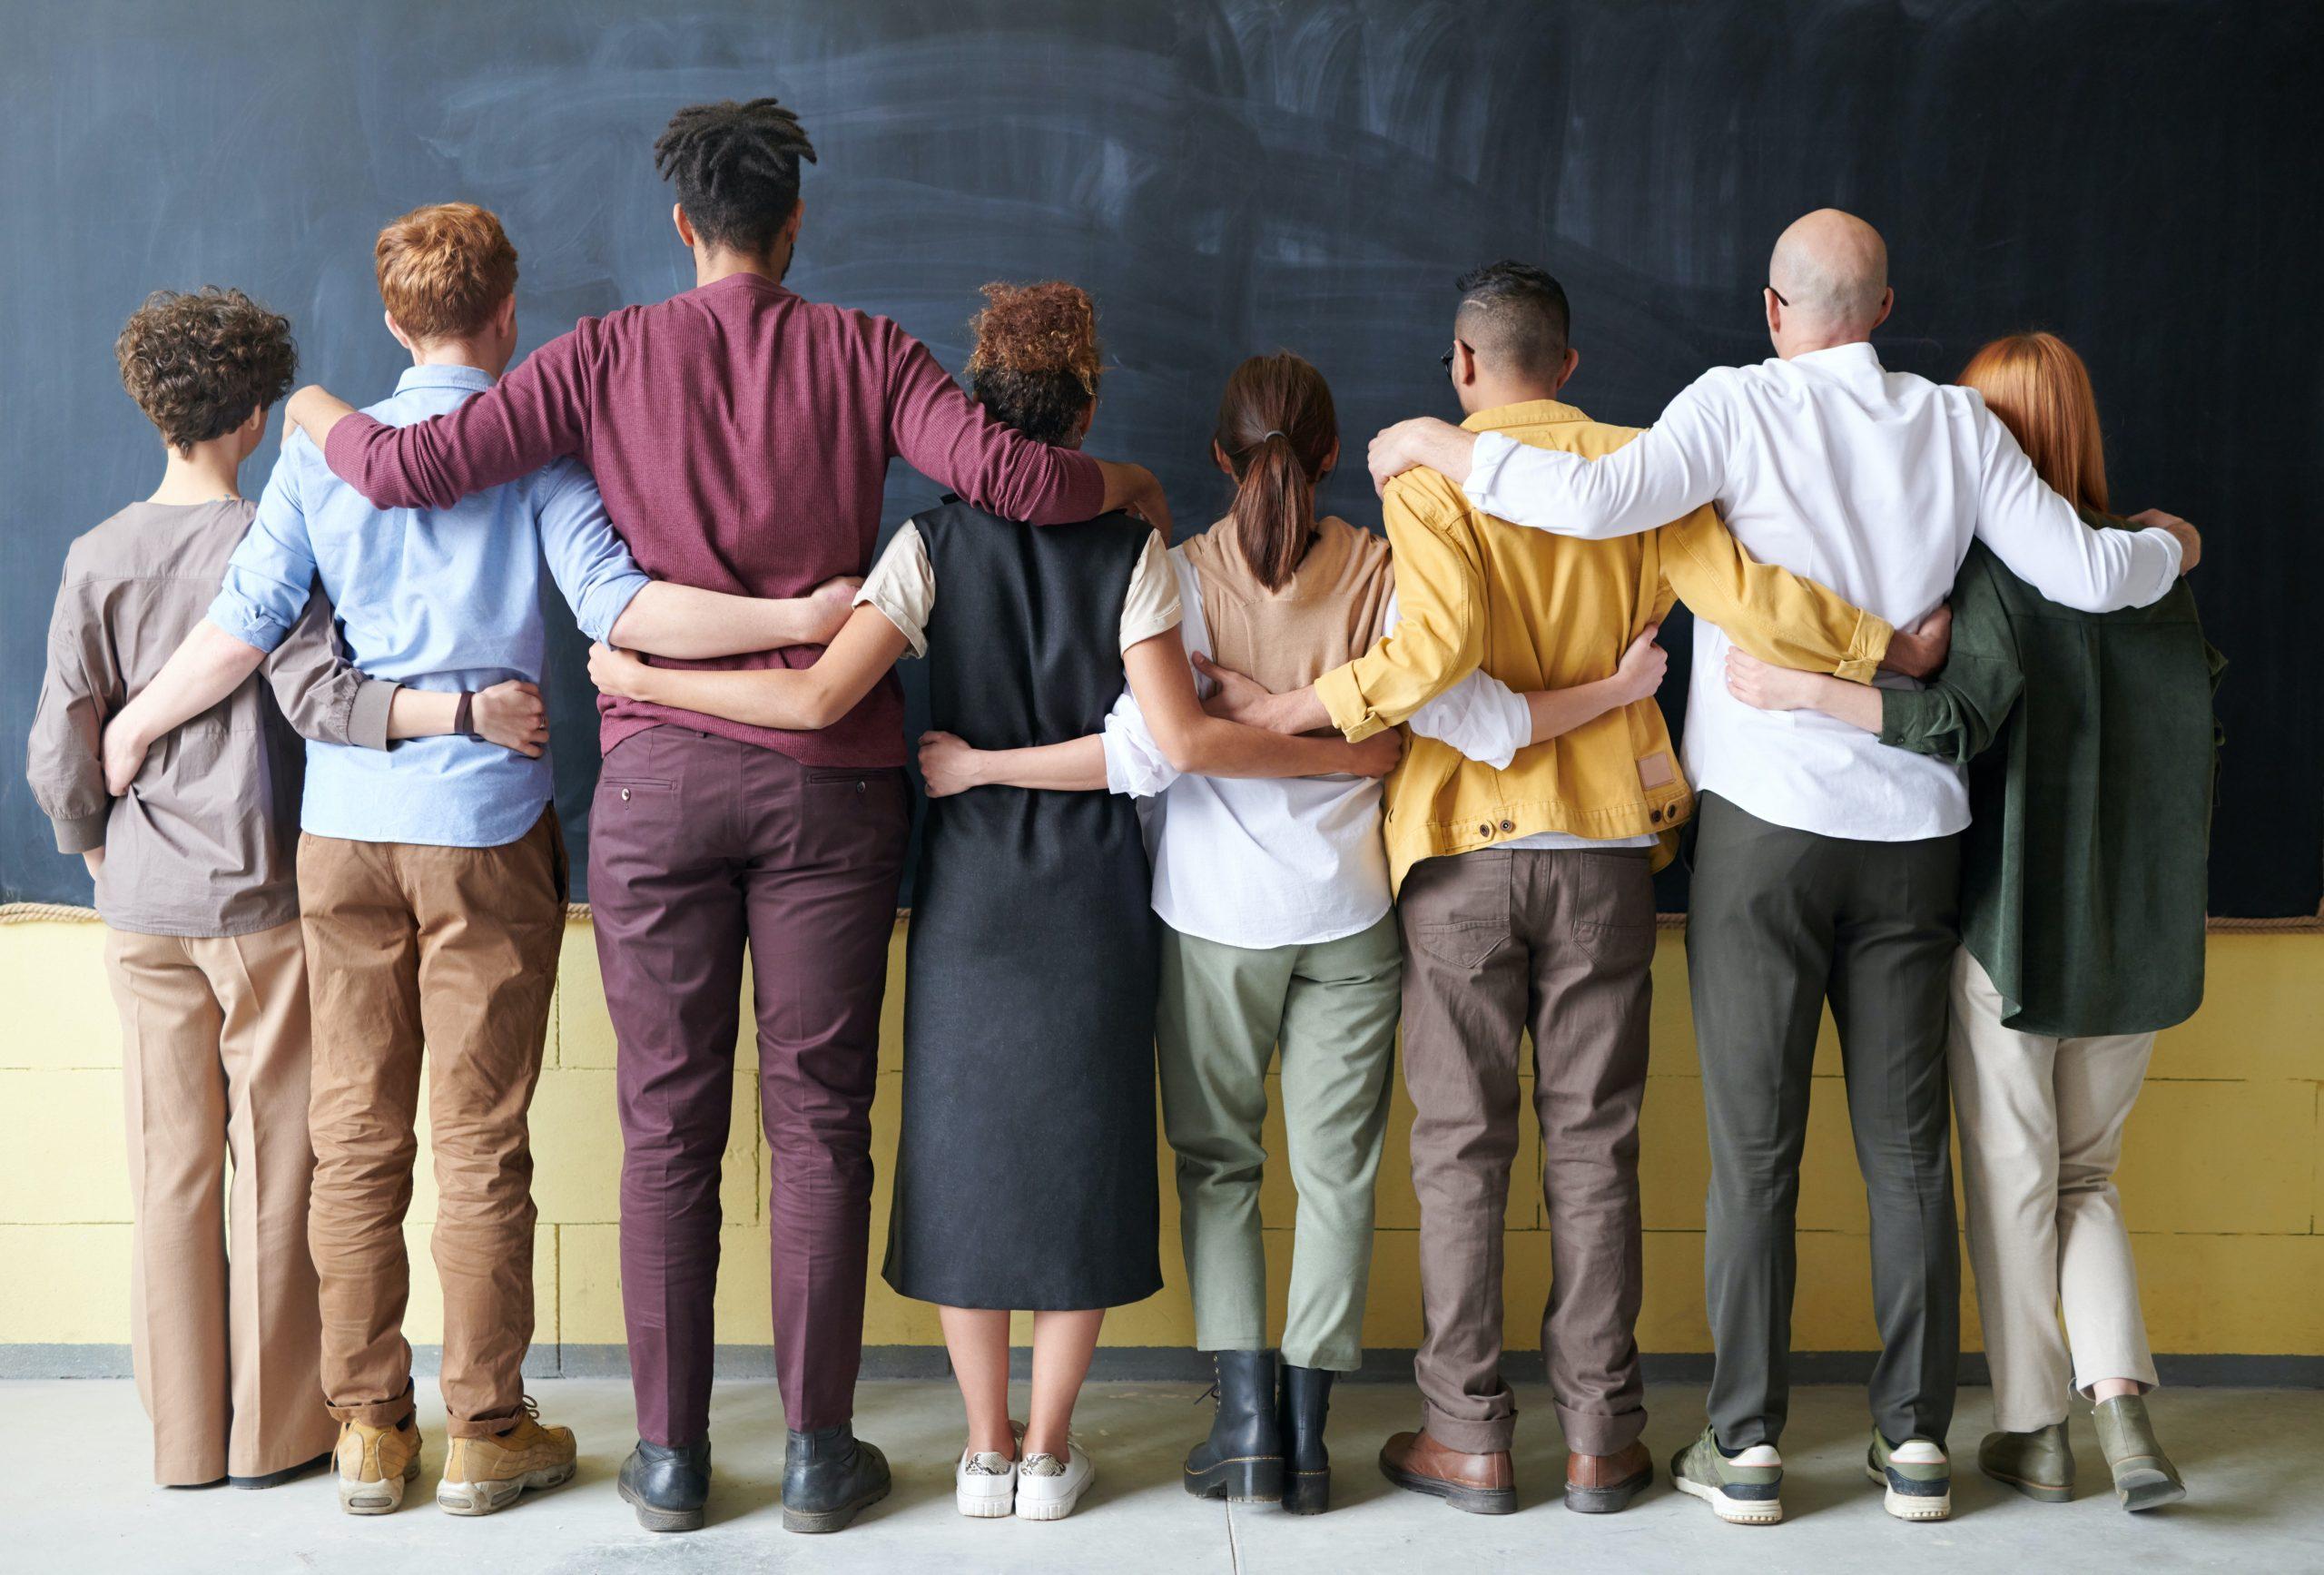 N'Gunu Tiny - gender diversity and social mobility in Africa